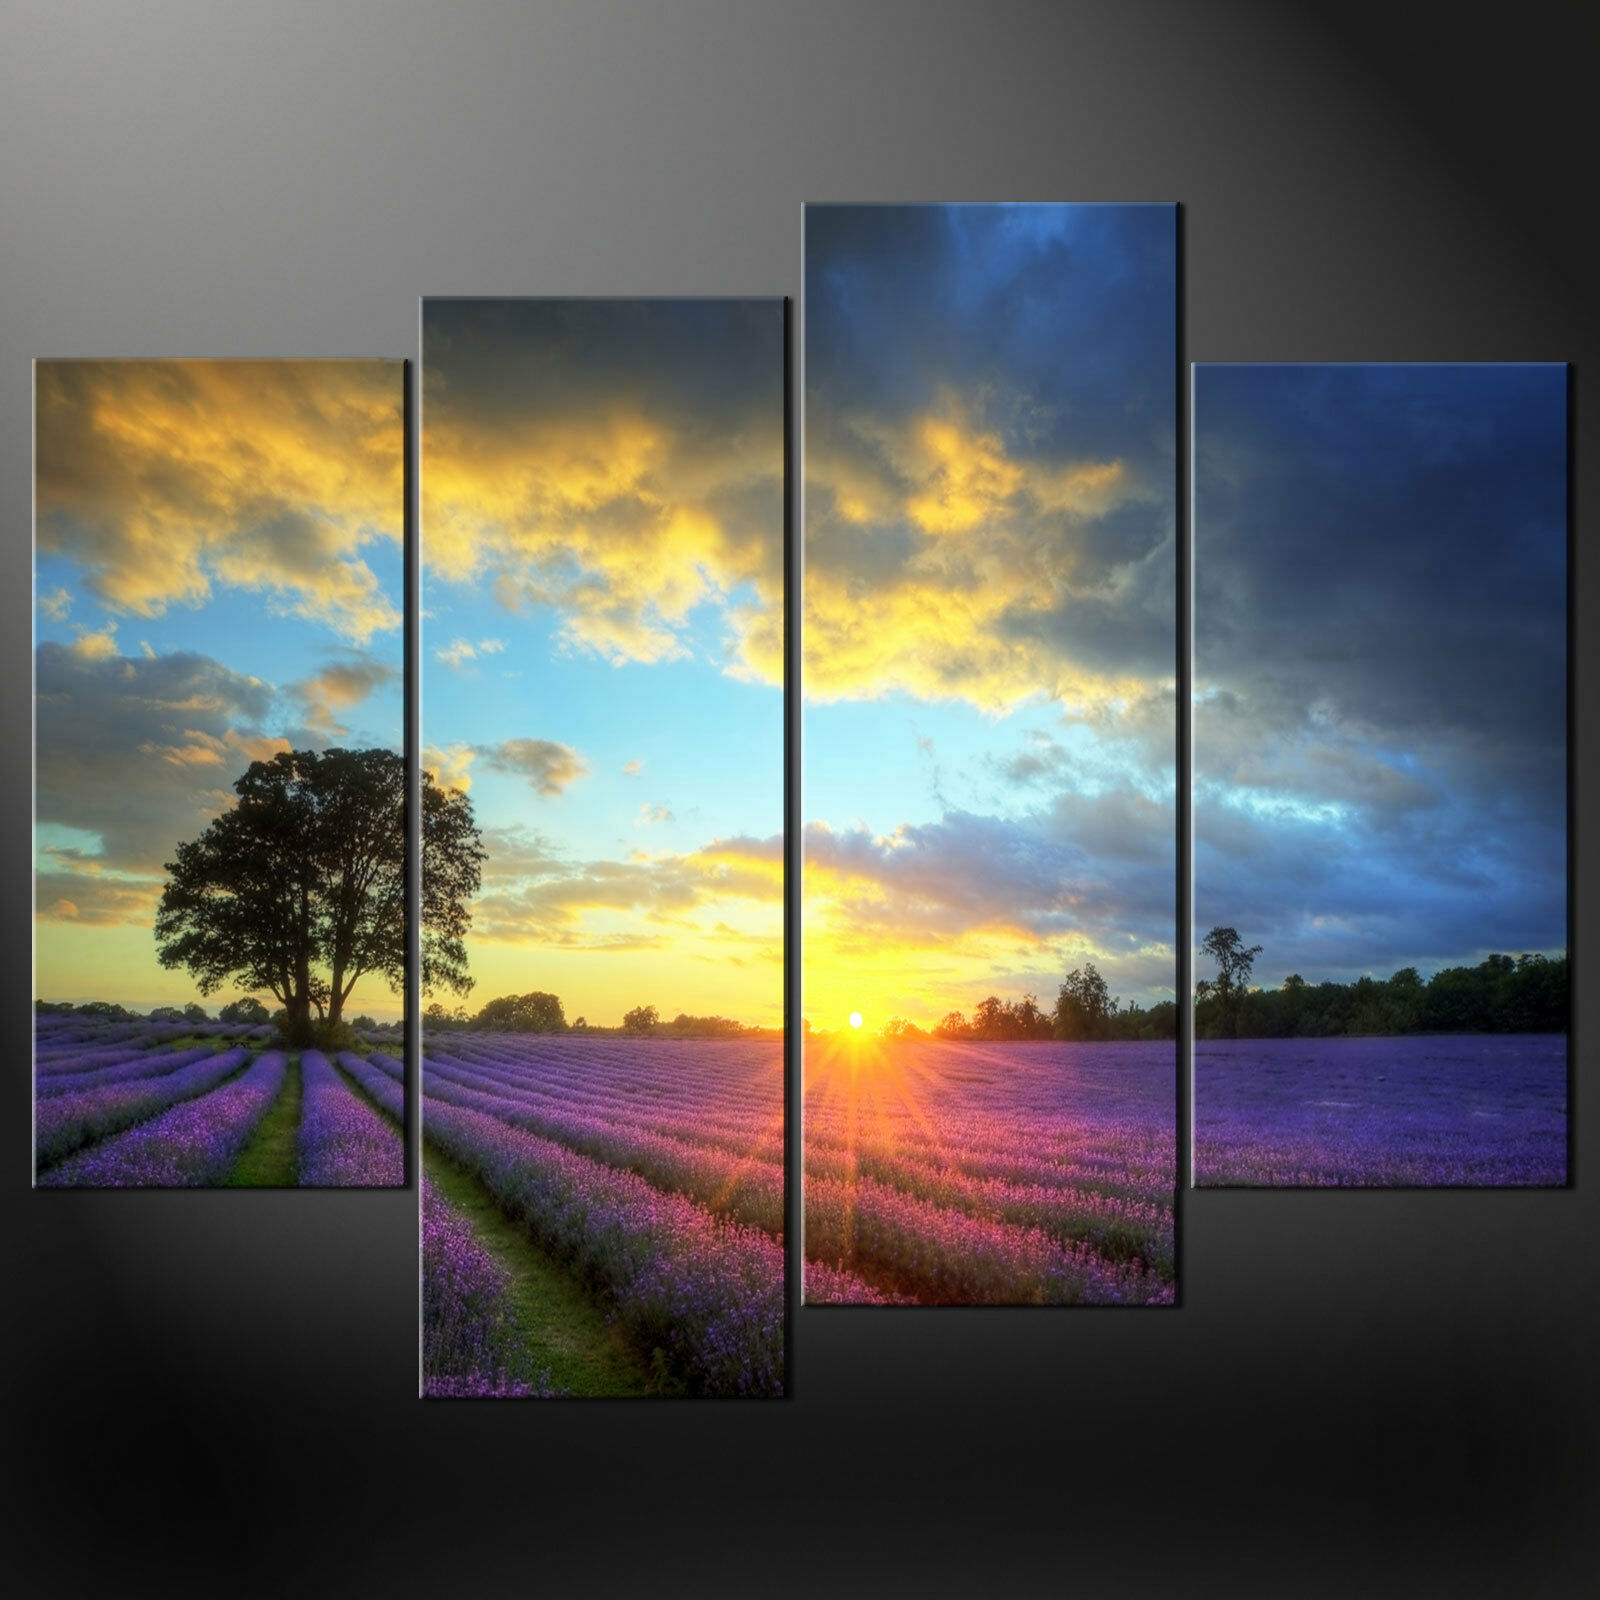 SUNRISE lila LAVENDERS CANVAS PRINT PICTURE WALL ART ART ART VARIETY OF GrößeS SET OF 4 95f190